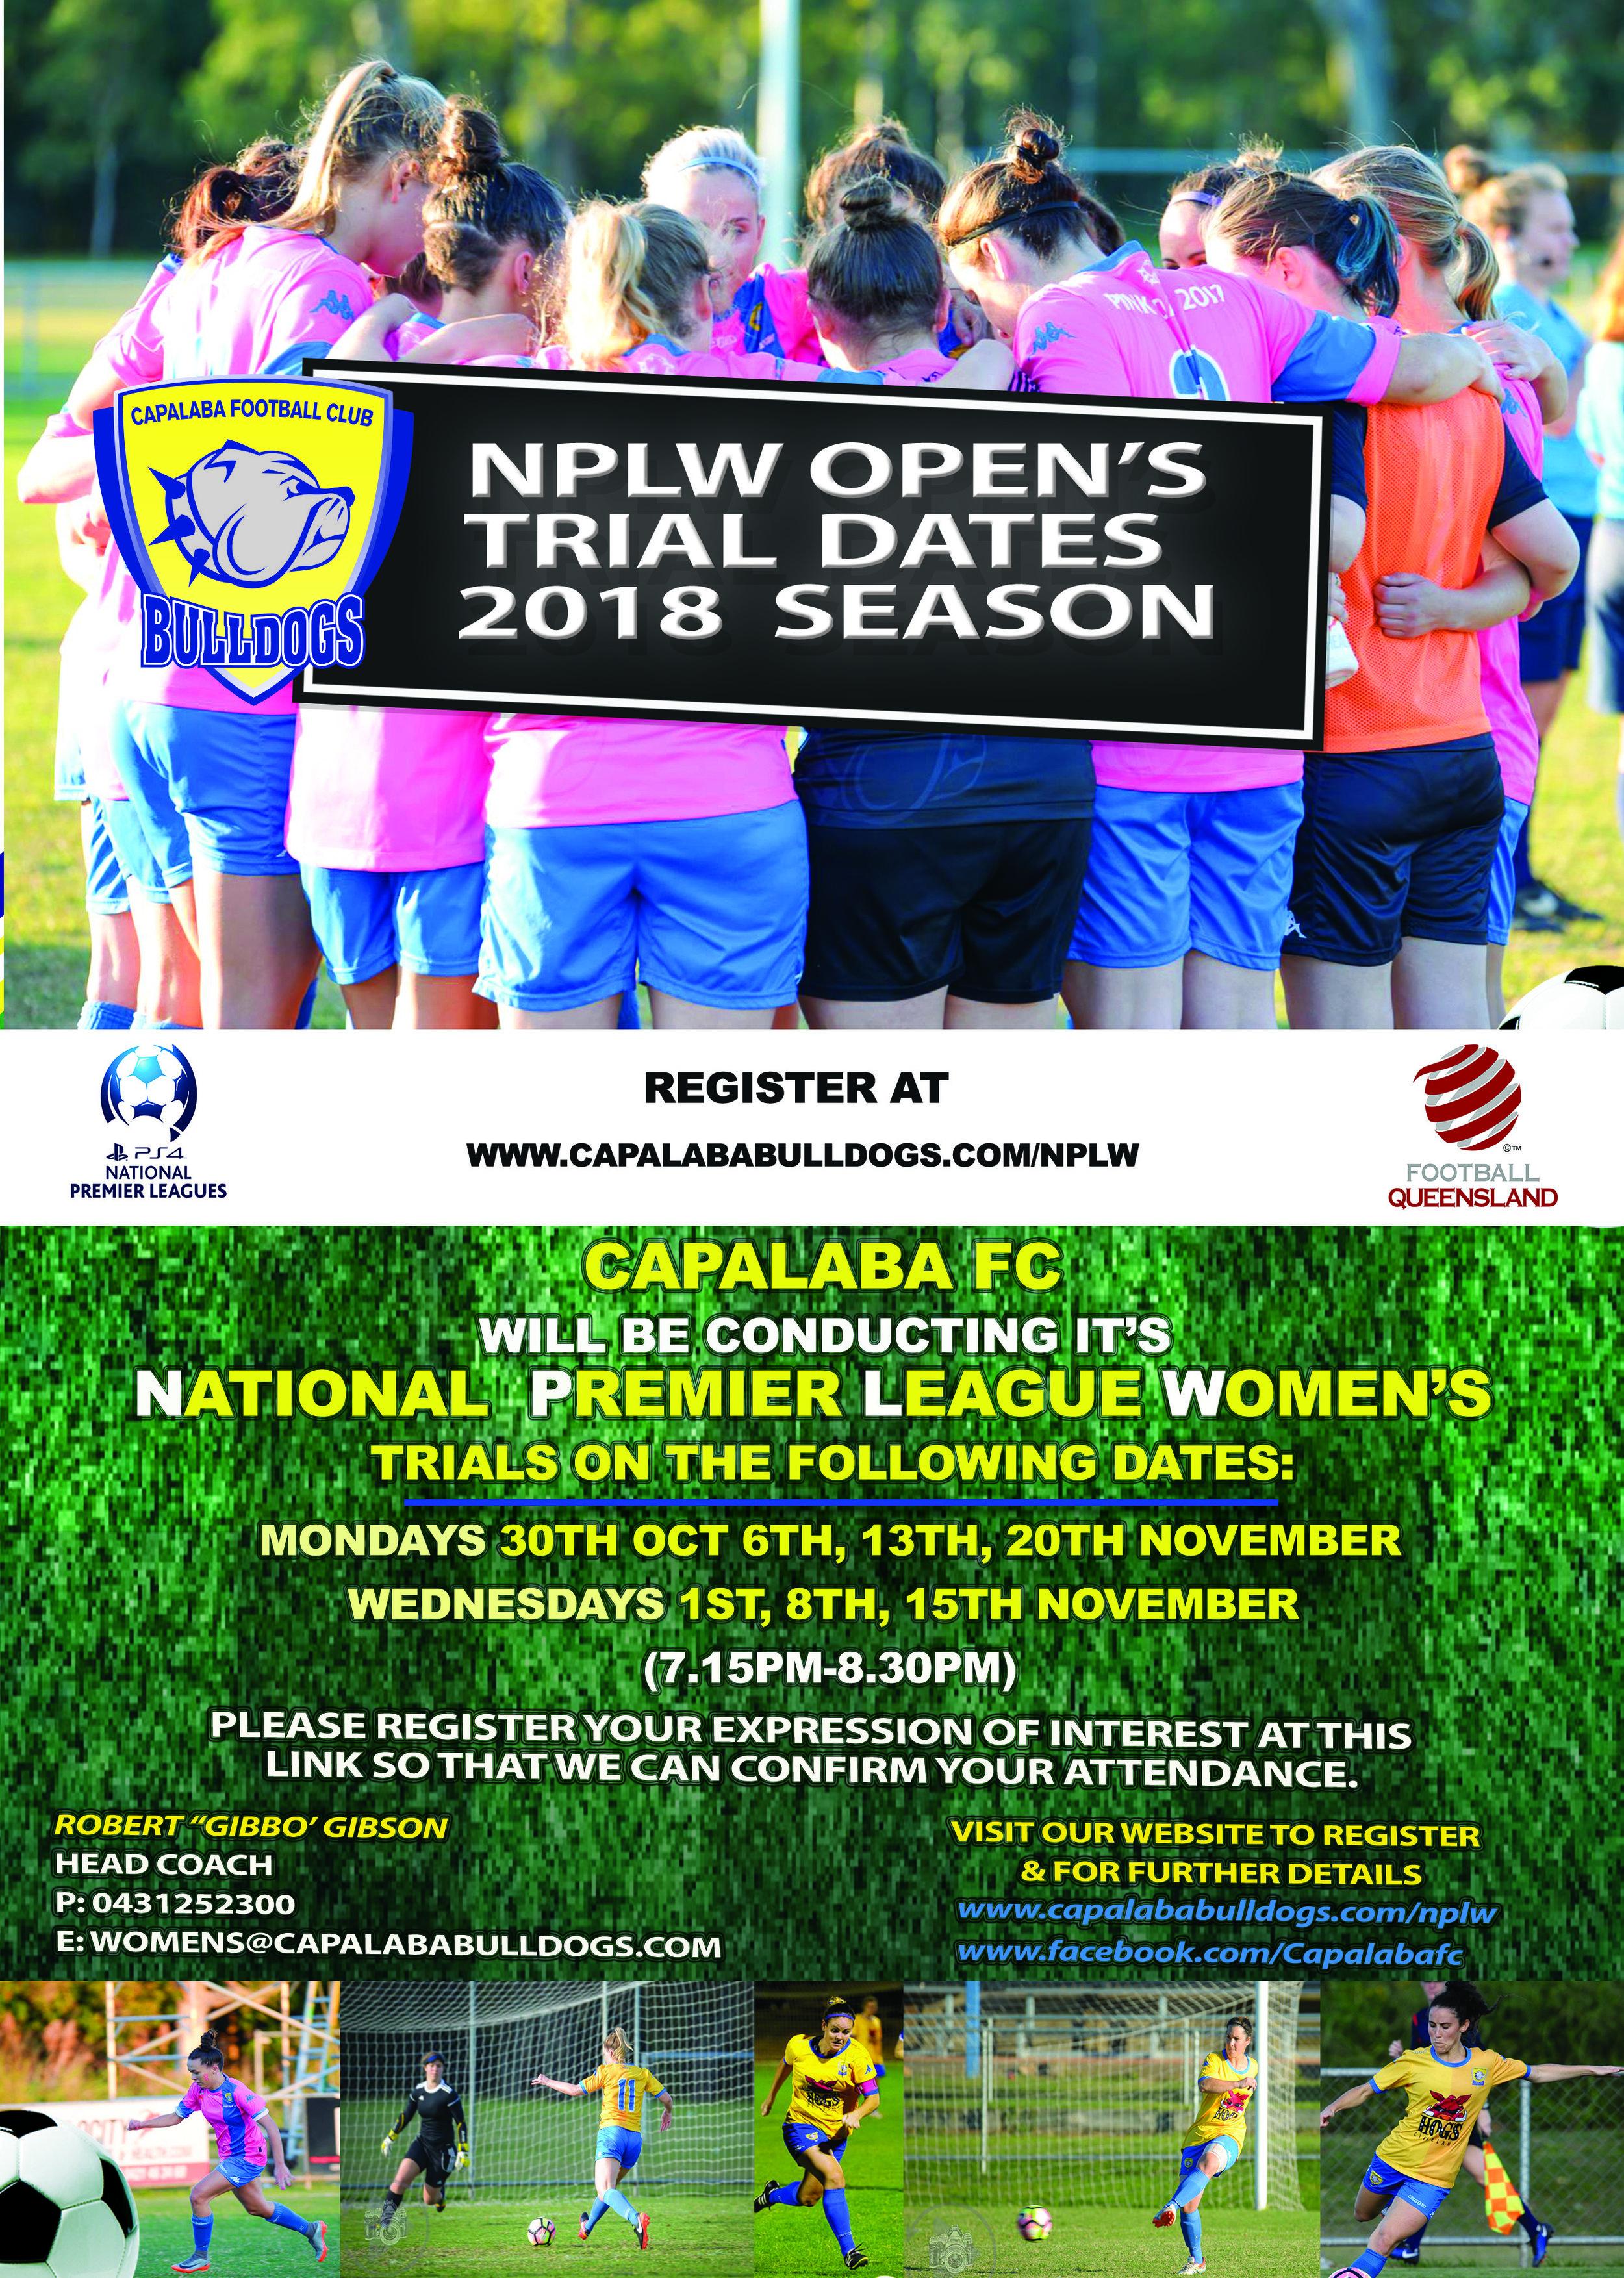 Capalaba FC NPLW Trial Dates 2017 Flyer OPENS.jpg